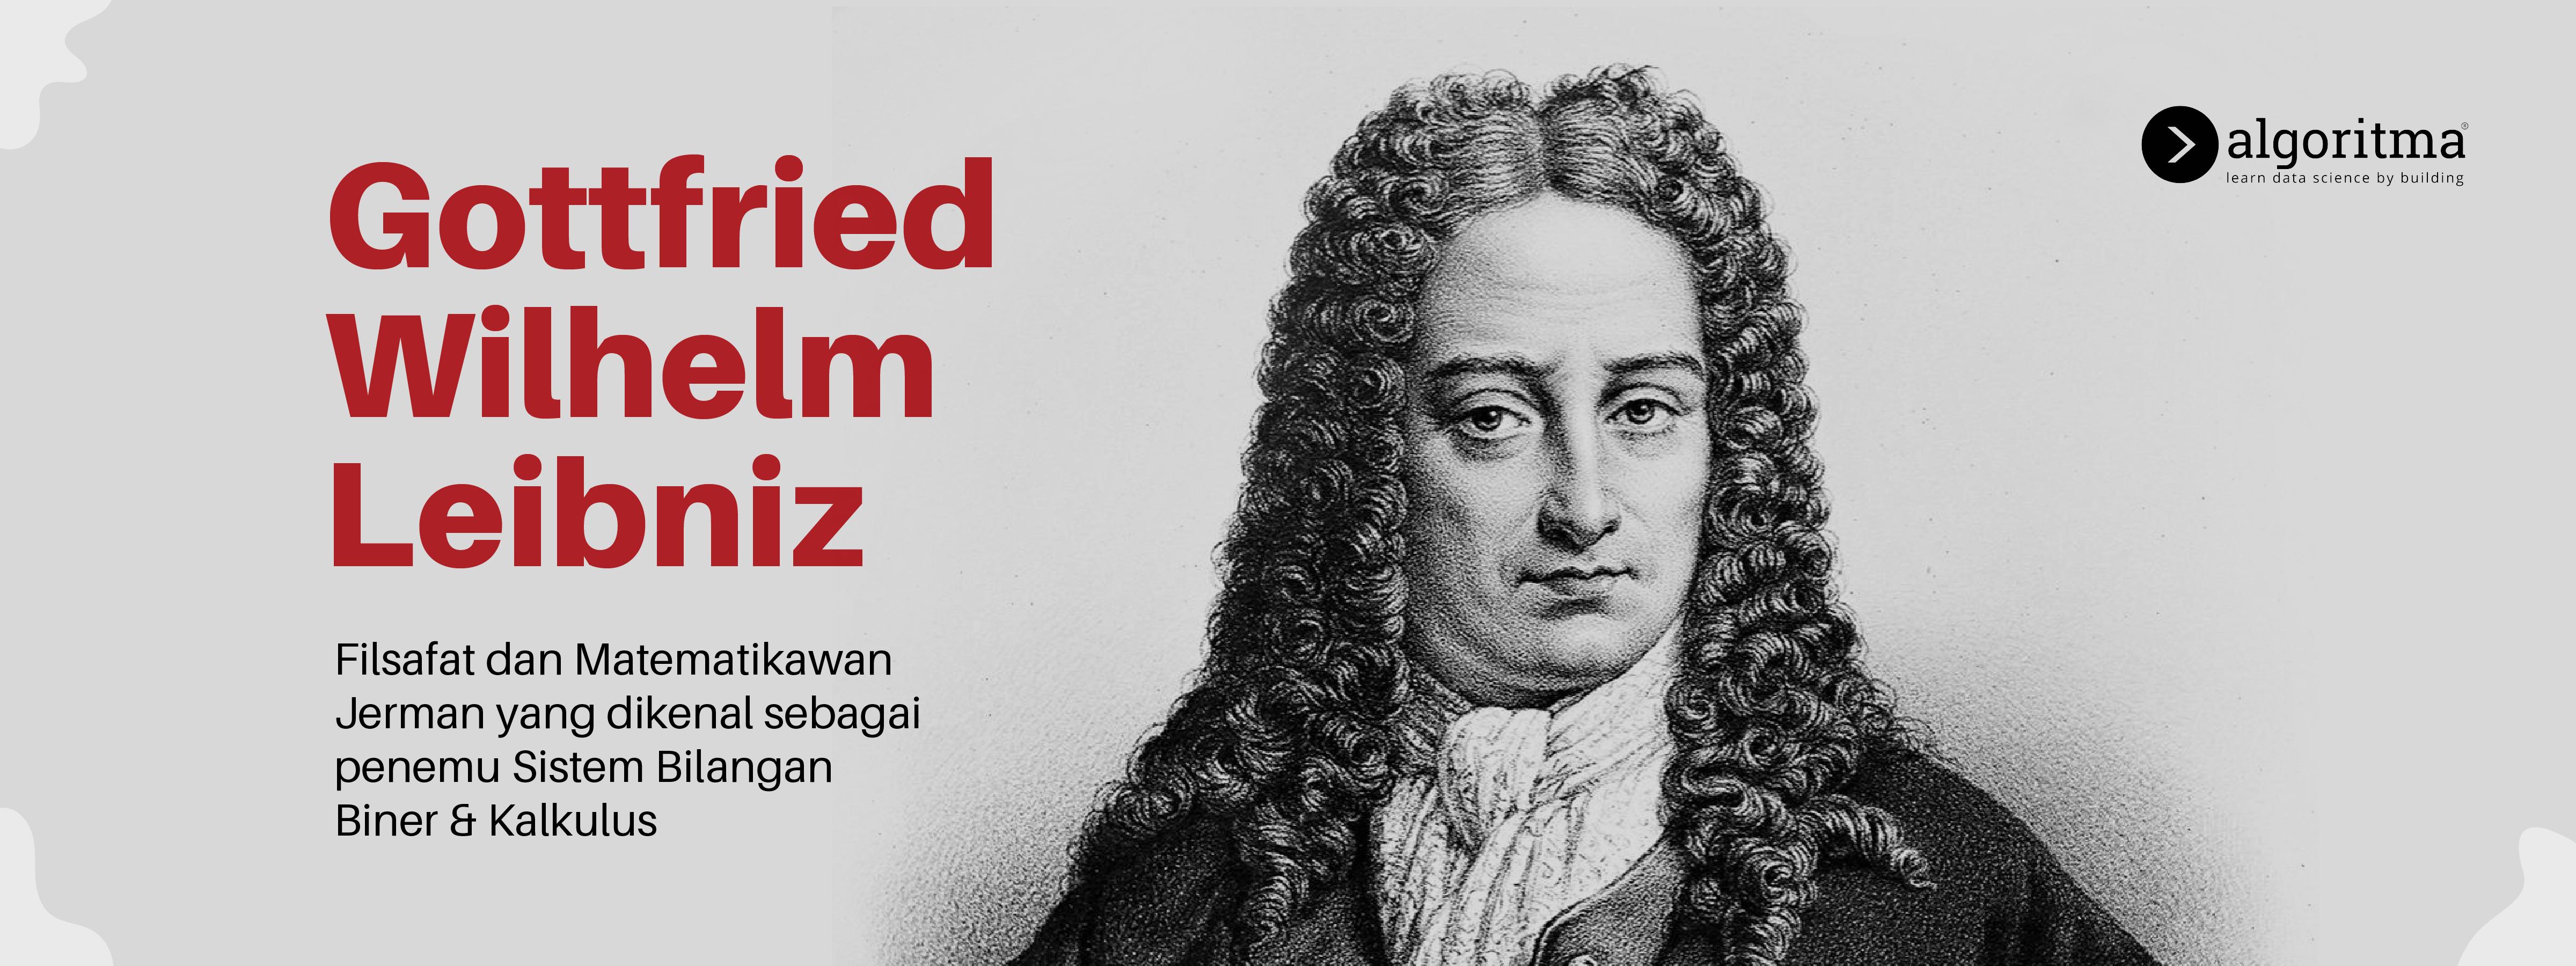 Wilhelm Leibniz: Penemu Sistem Bilangan Biner & Kalkulus